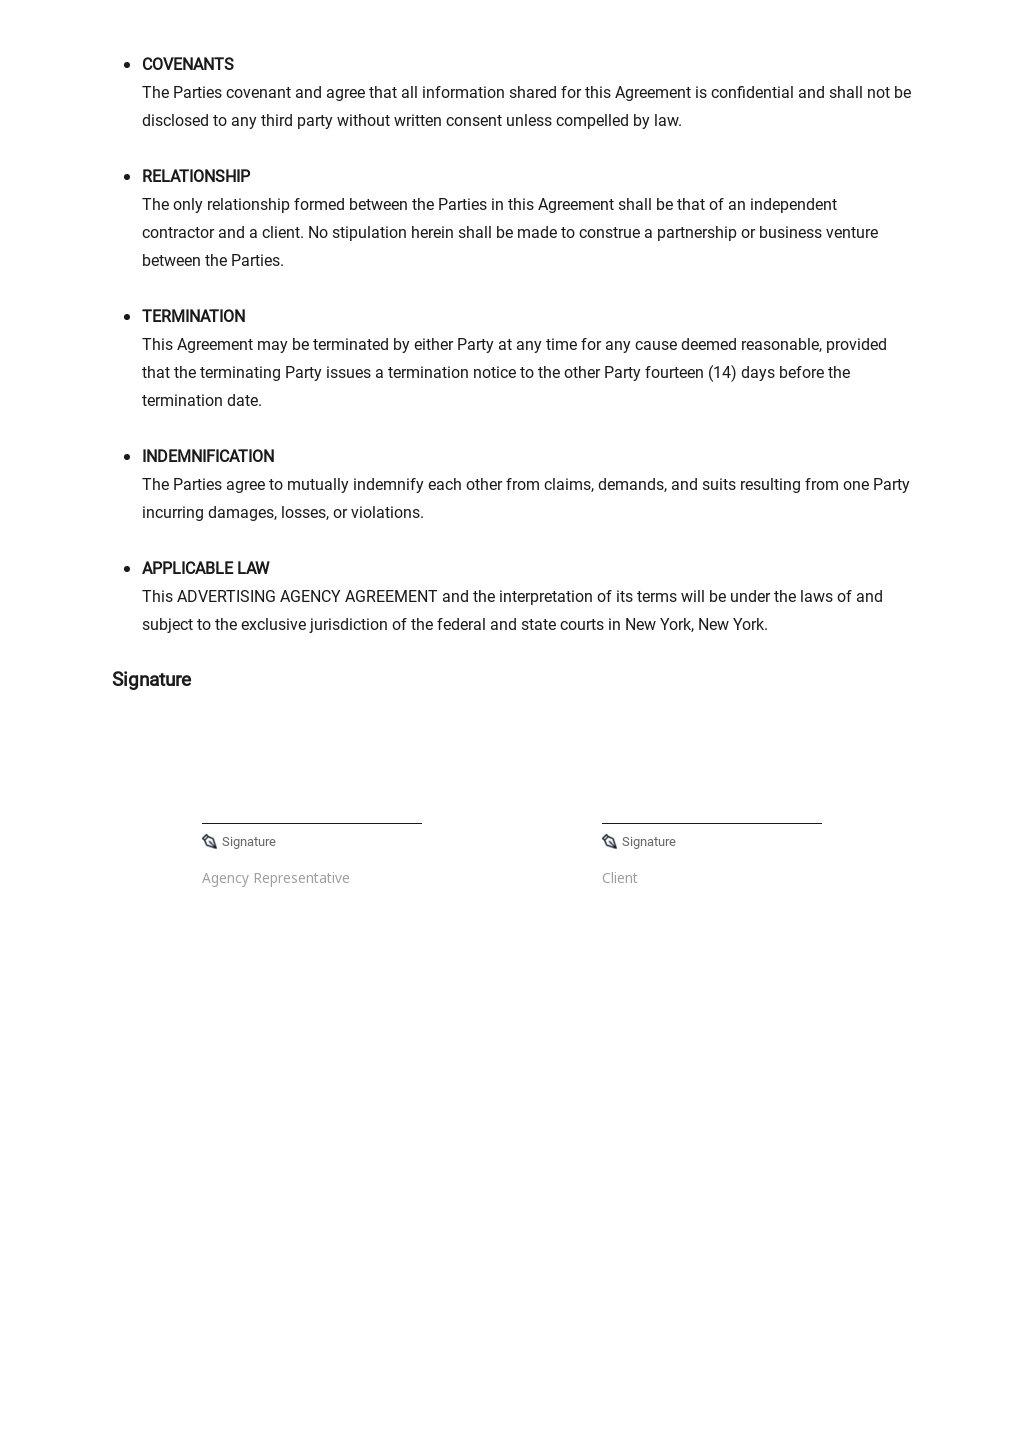 Free Sample Advertising Agency Agreement Template 2.jpe